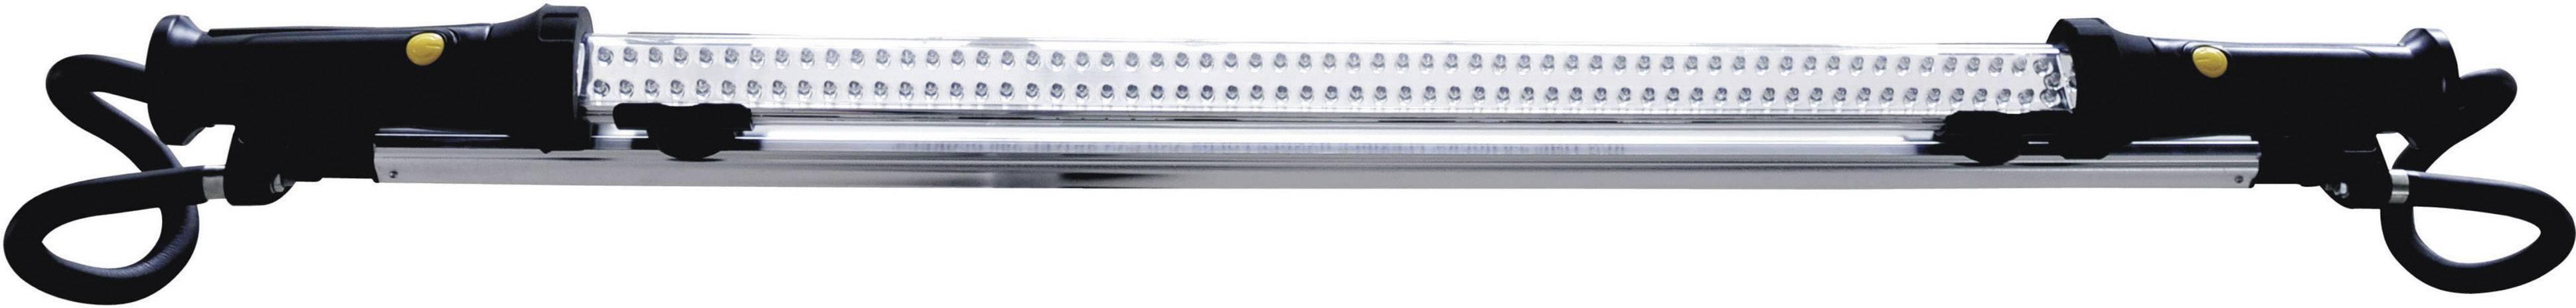 Pracovné LED svietidlo Ampercel, 120 LED